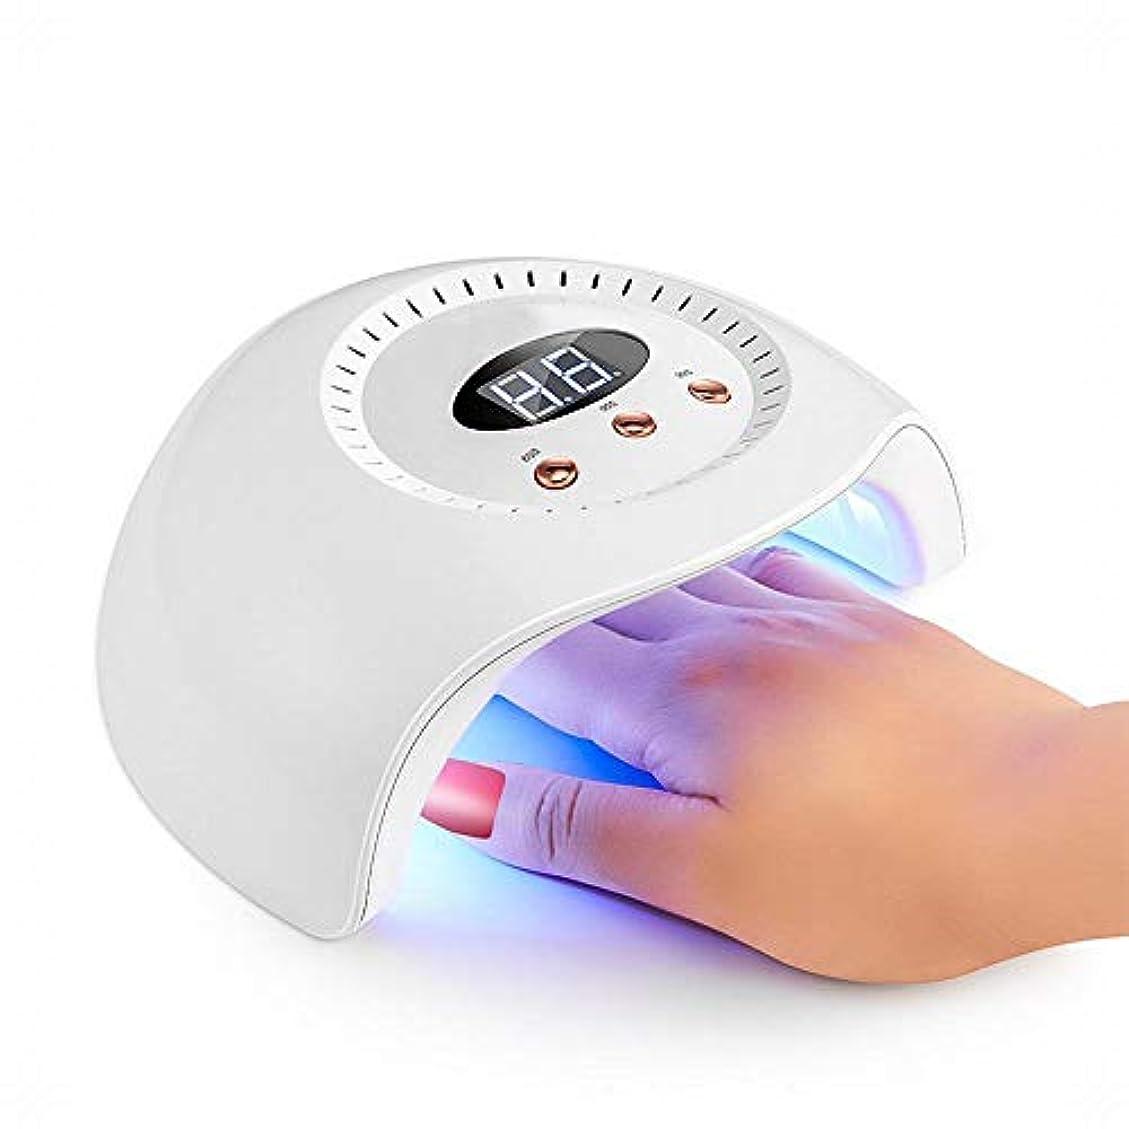 YESONEEP ネイルランプ24ワットネイル光線療法ランプインテリジェント誘導ネイル機デュアル光源led光線療法ランプネイルスマート乾燥 (Size : 24W)